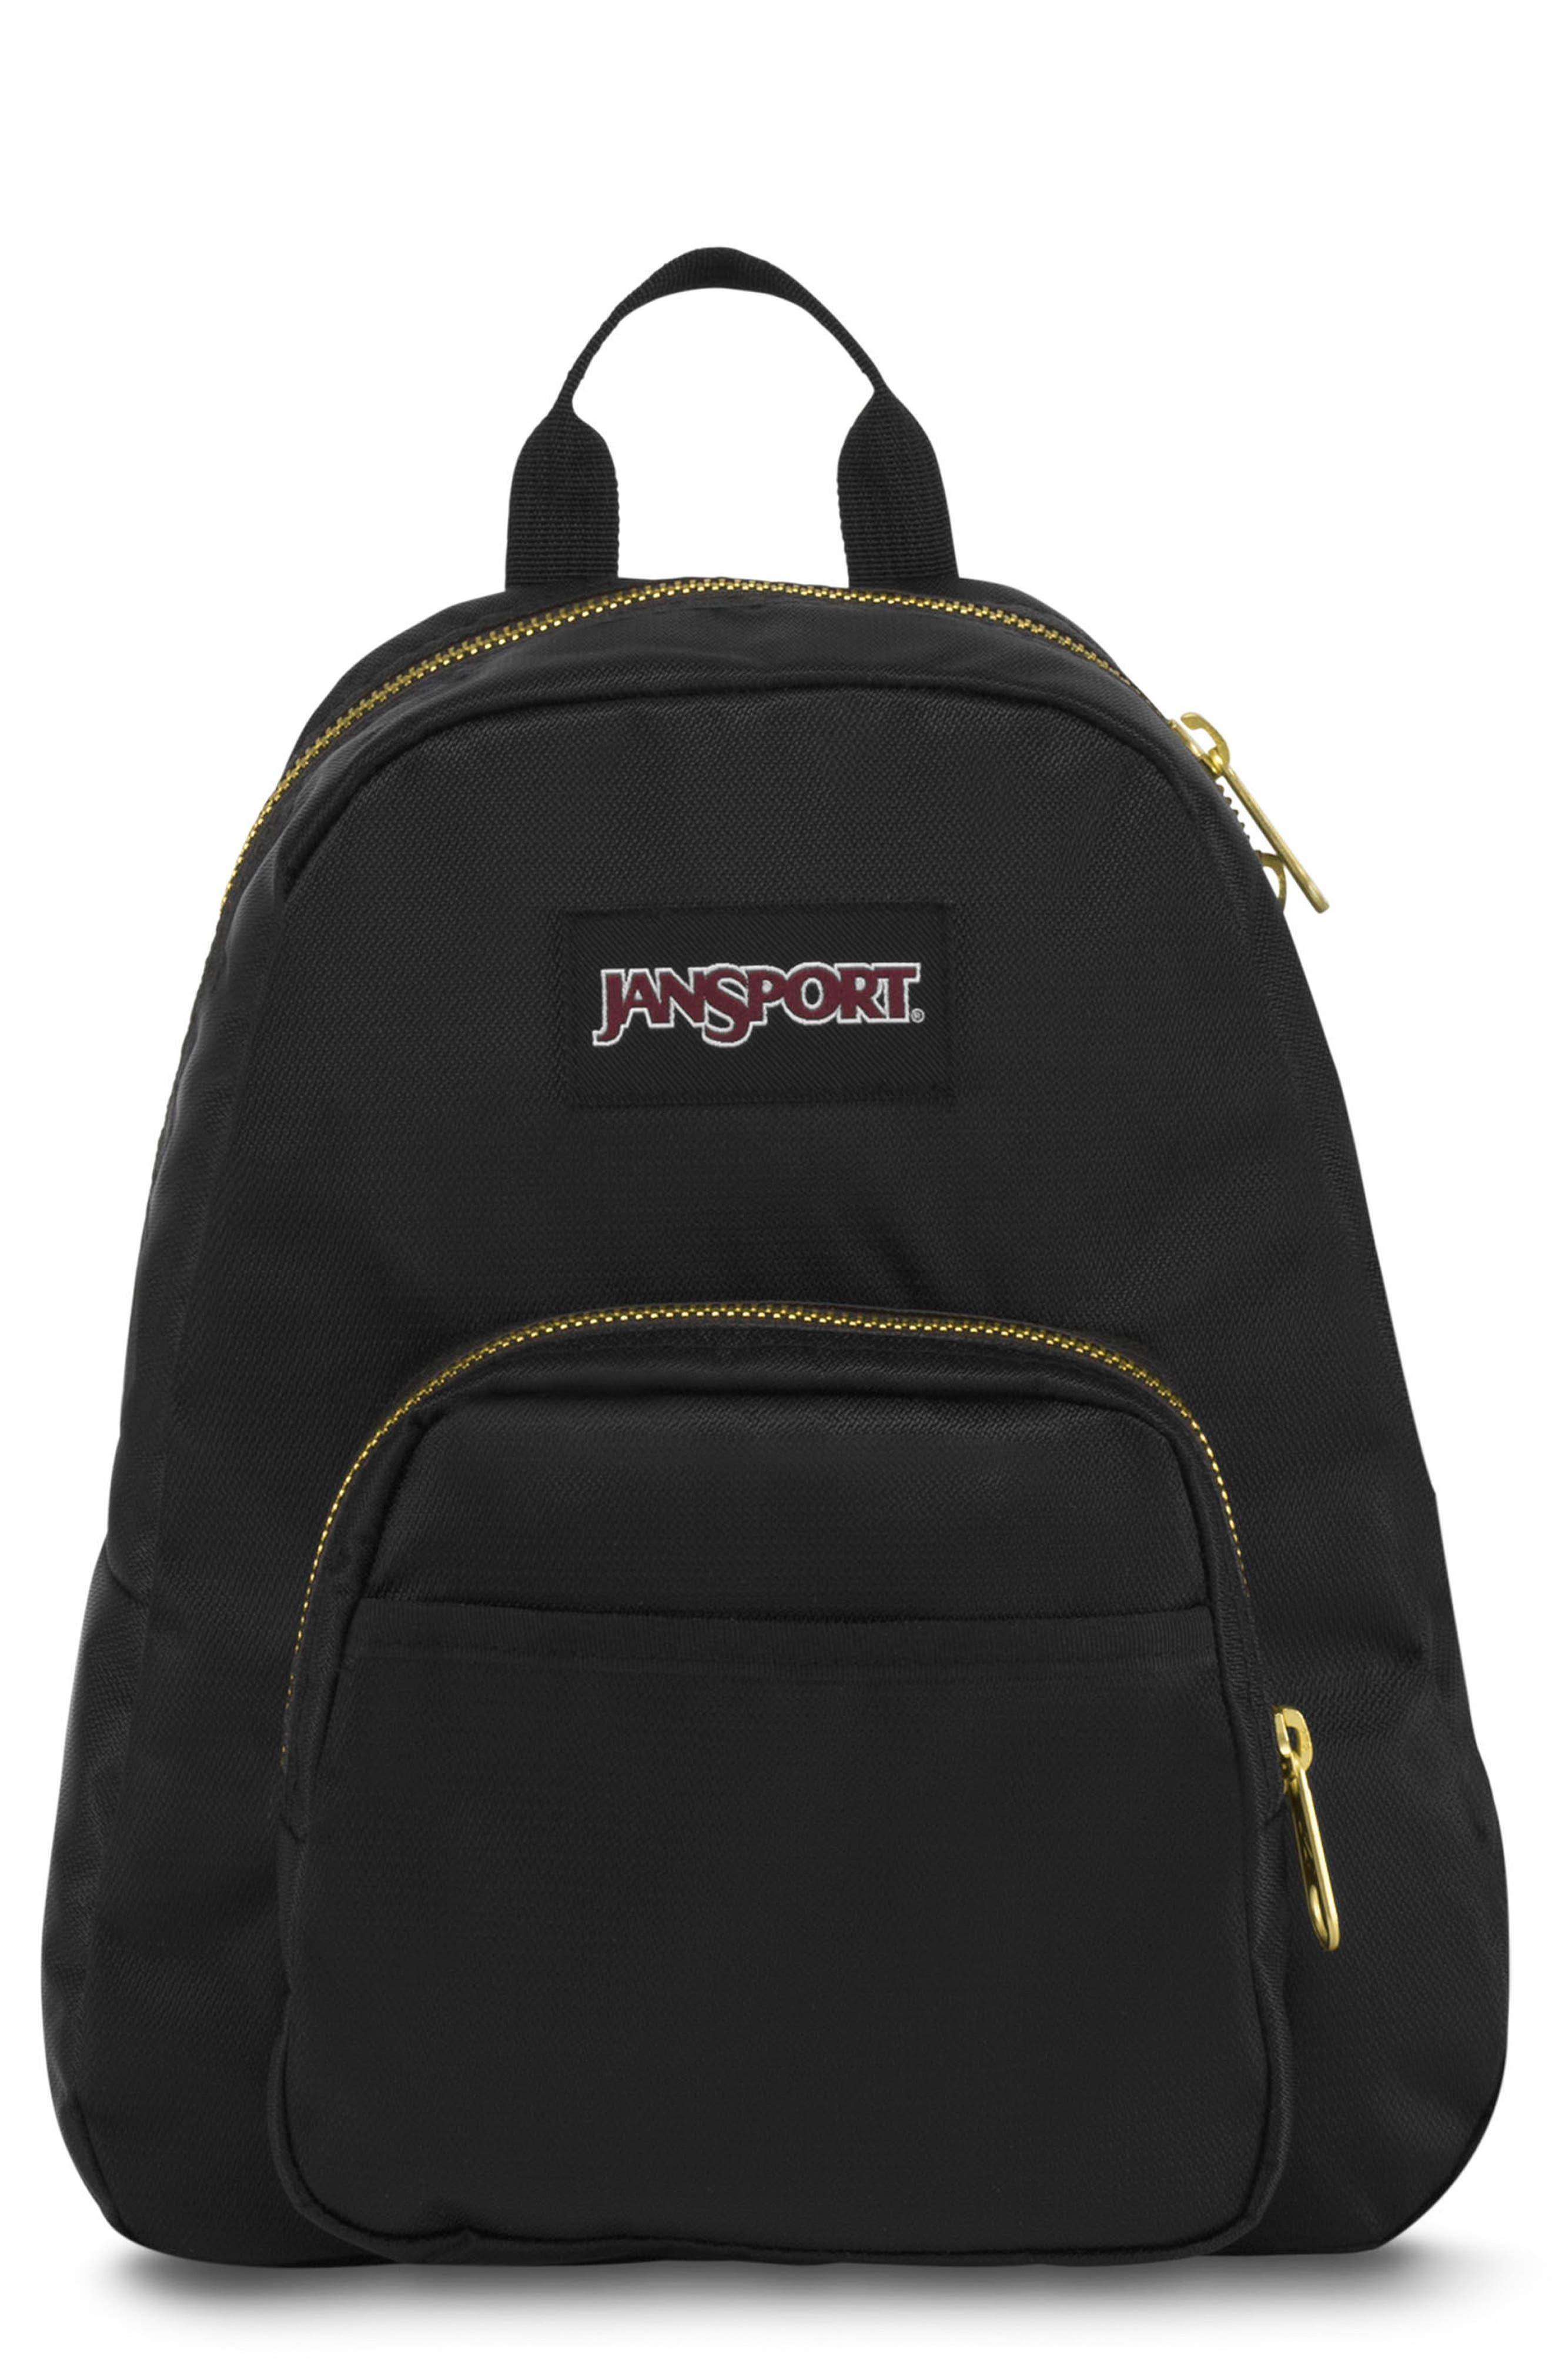 Half Pint FX Backpack,                             Main thumbnail 1, color,                             BLACK GOLD